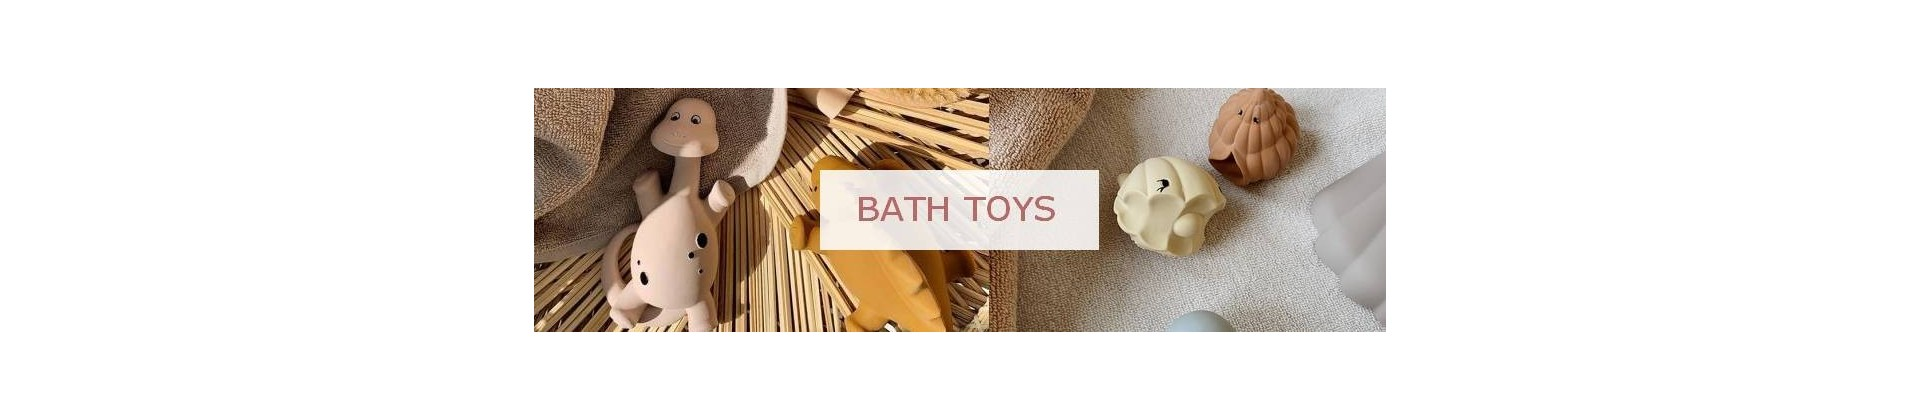 baby bath toys online